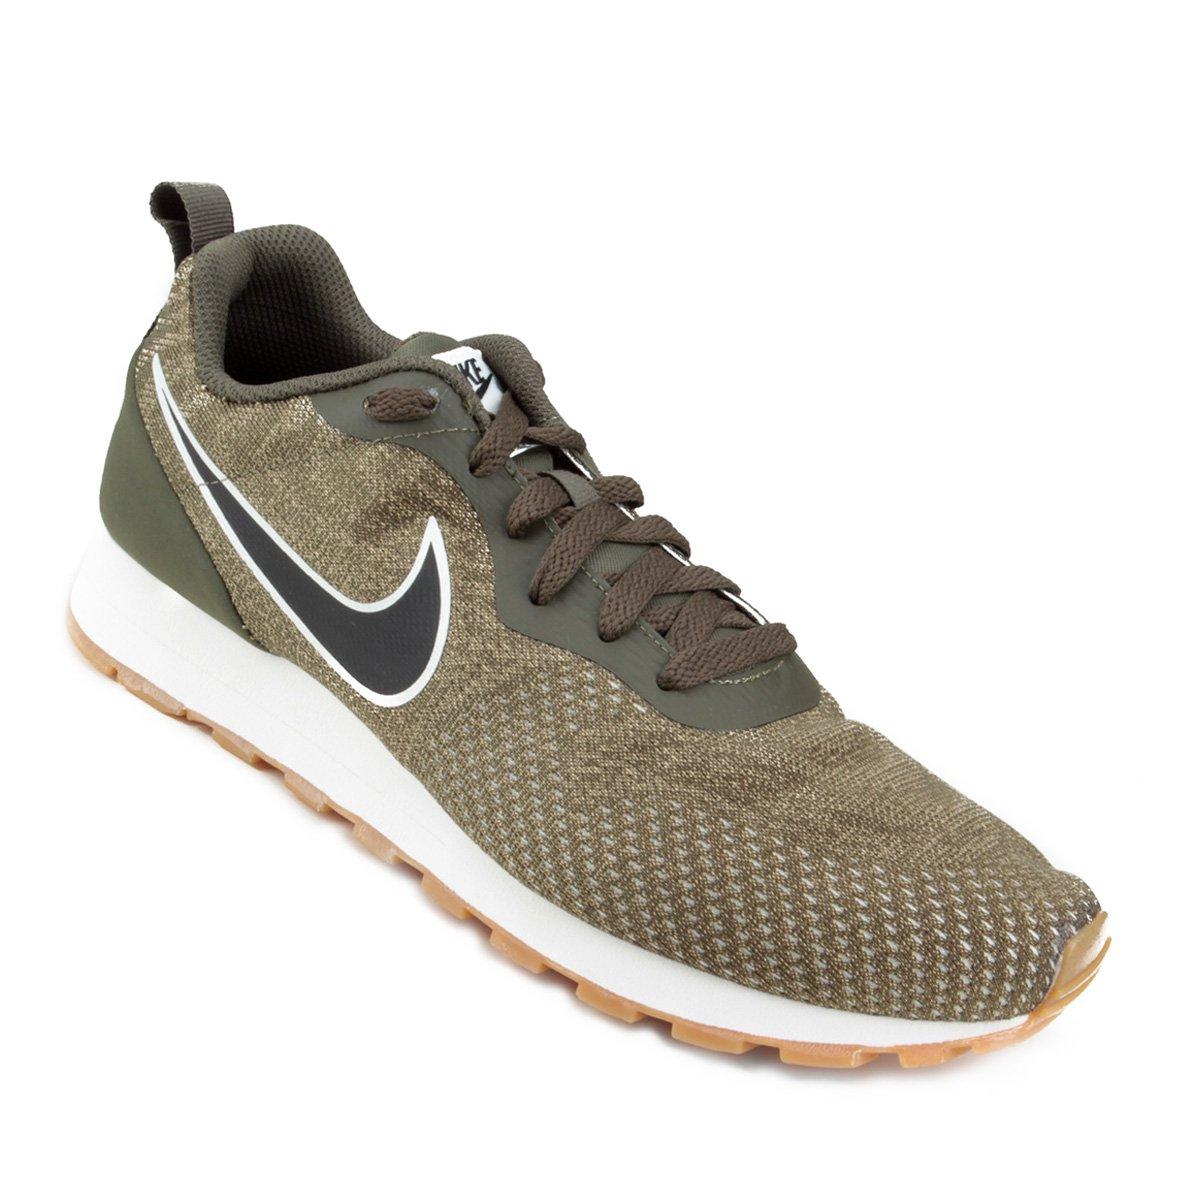 d90685c62b Tênis Nike Md Runner 2 Eng Mesh Masculino - Musgo - Compre Agora ...